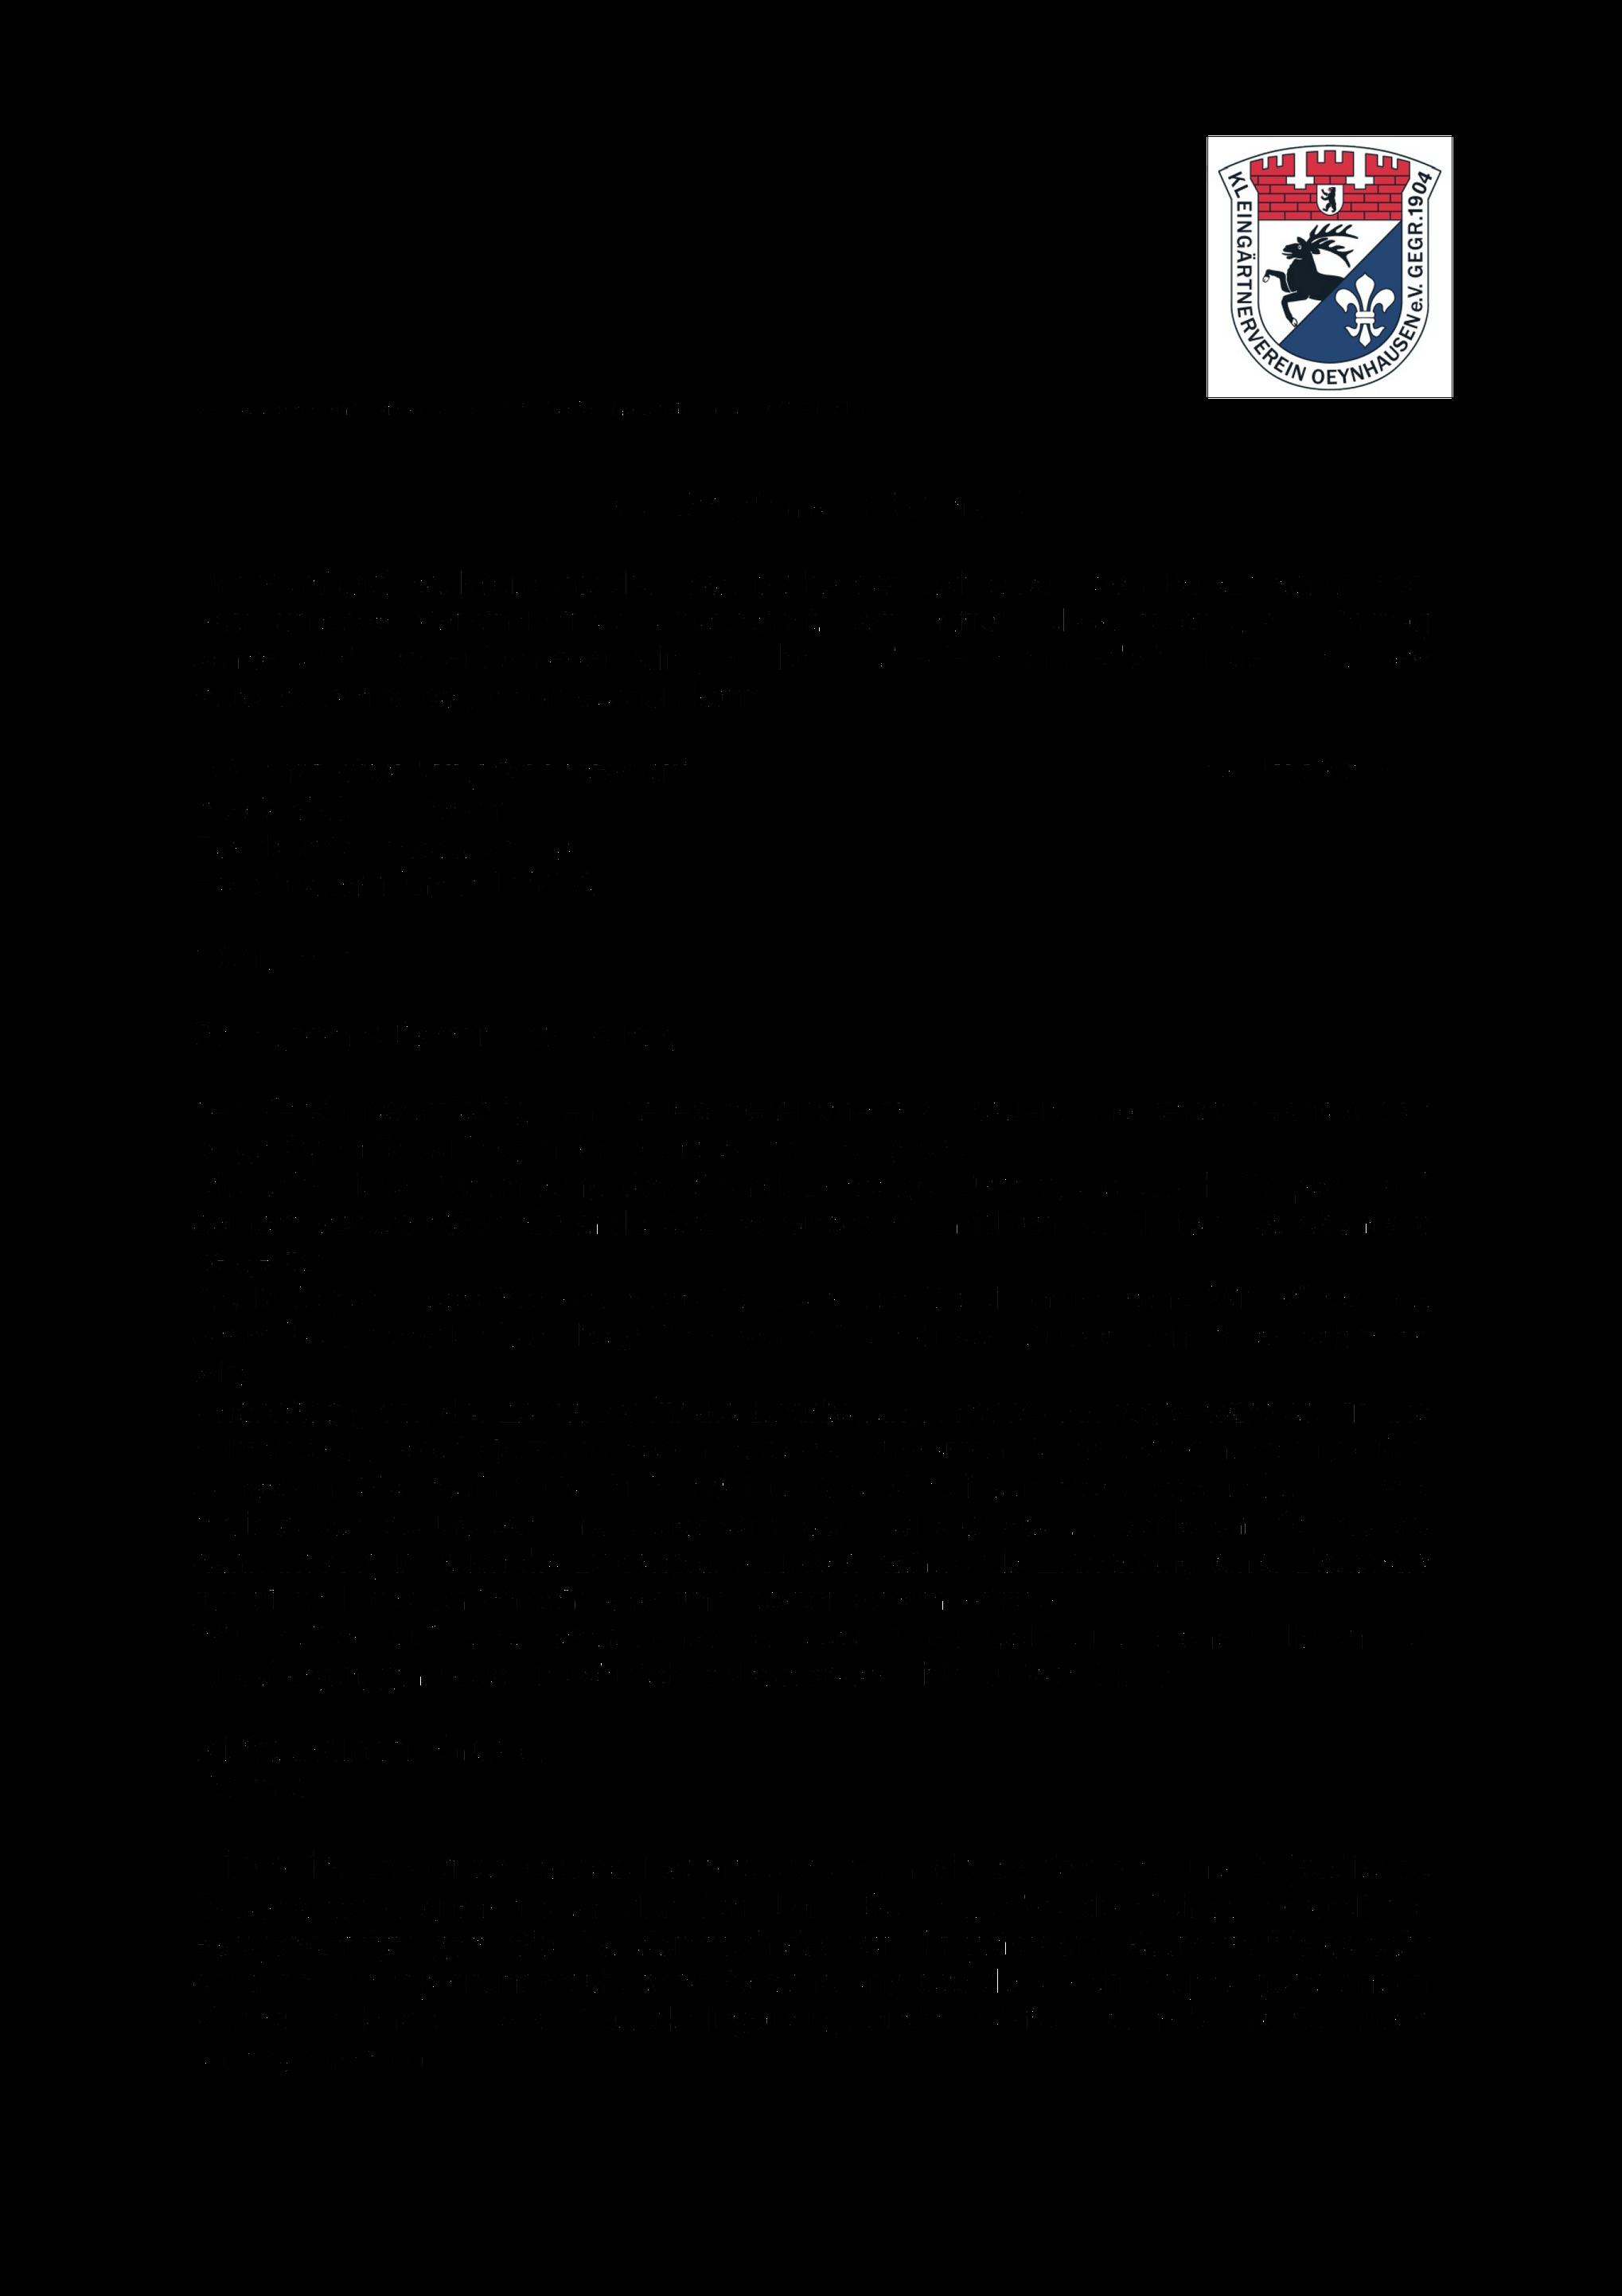 Dorable Bauantrag Format Image - FORTSETZUNG ARBEITSBLATT - tsuhaan.info